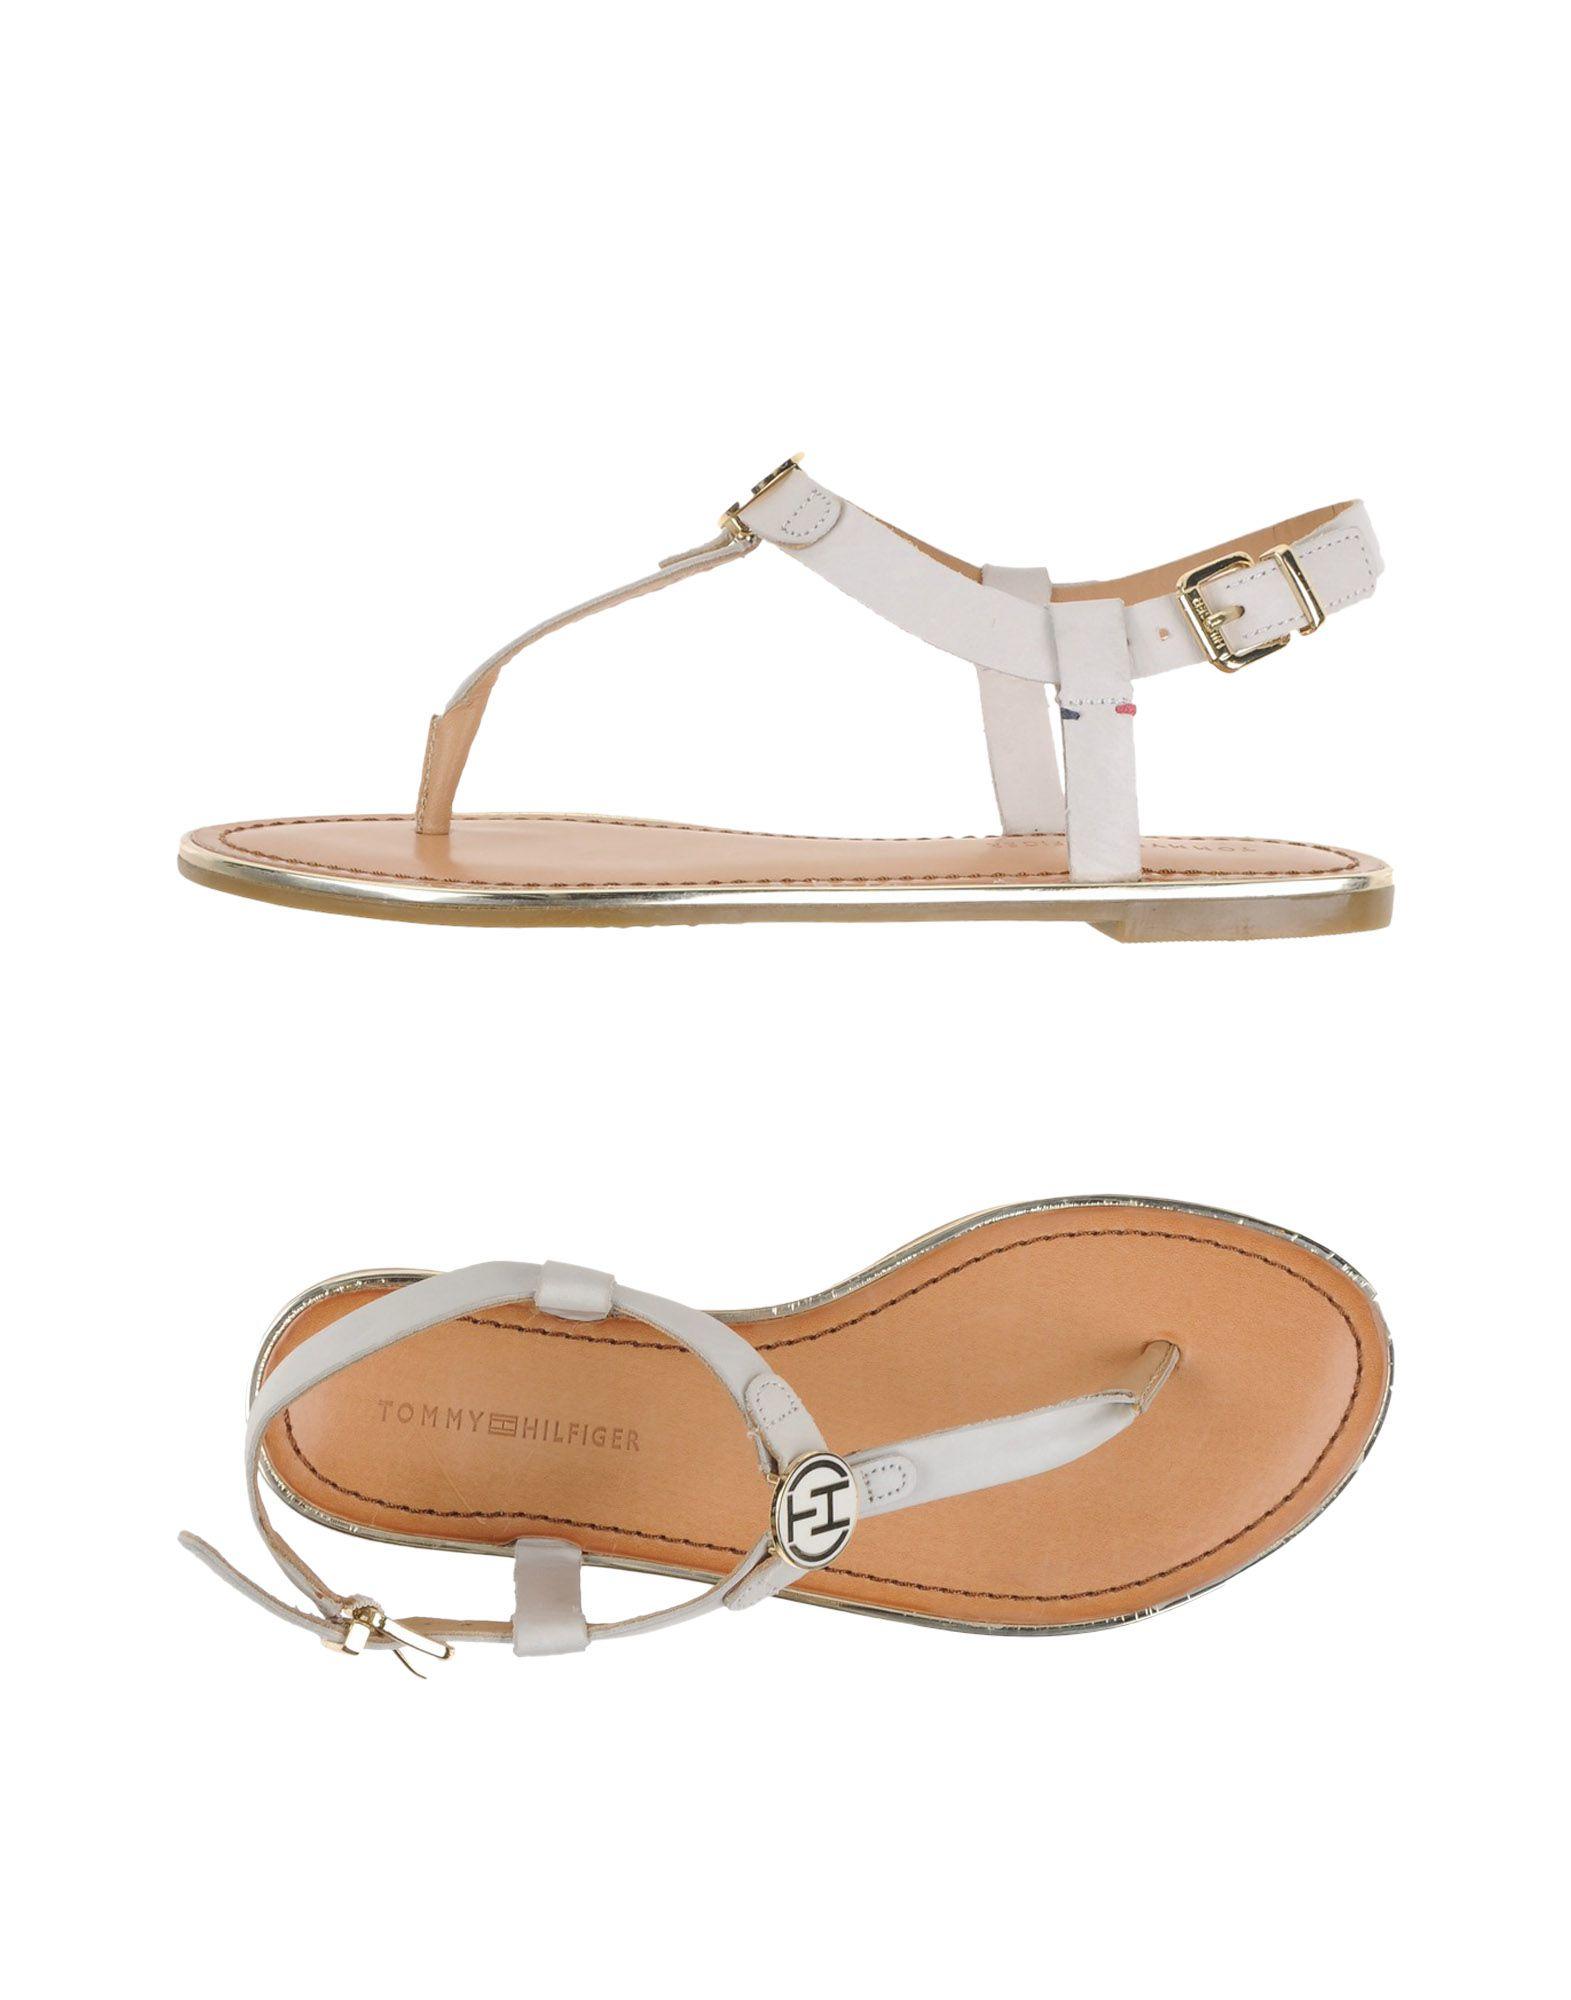 Cool Tommy Hilfiger Lorine Womens Sandal Low Heel Shoes Flat Heel  EBay